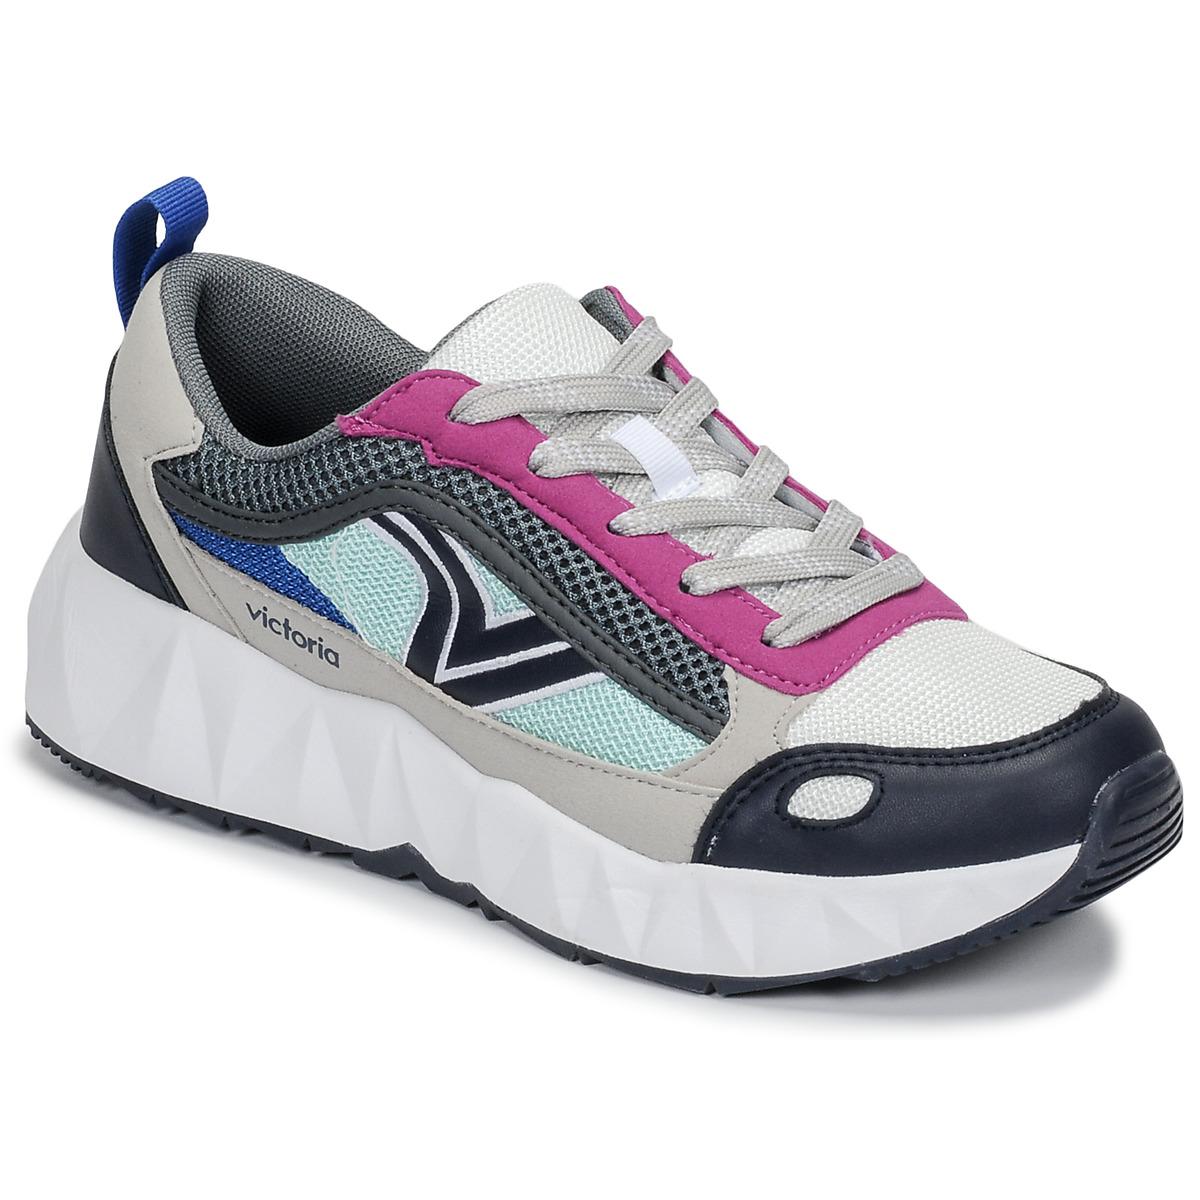 Sneakers Victoria  ARISTA MULTICOLOR